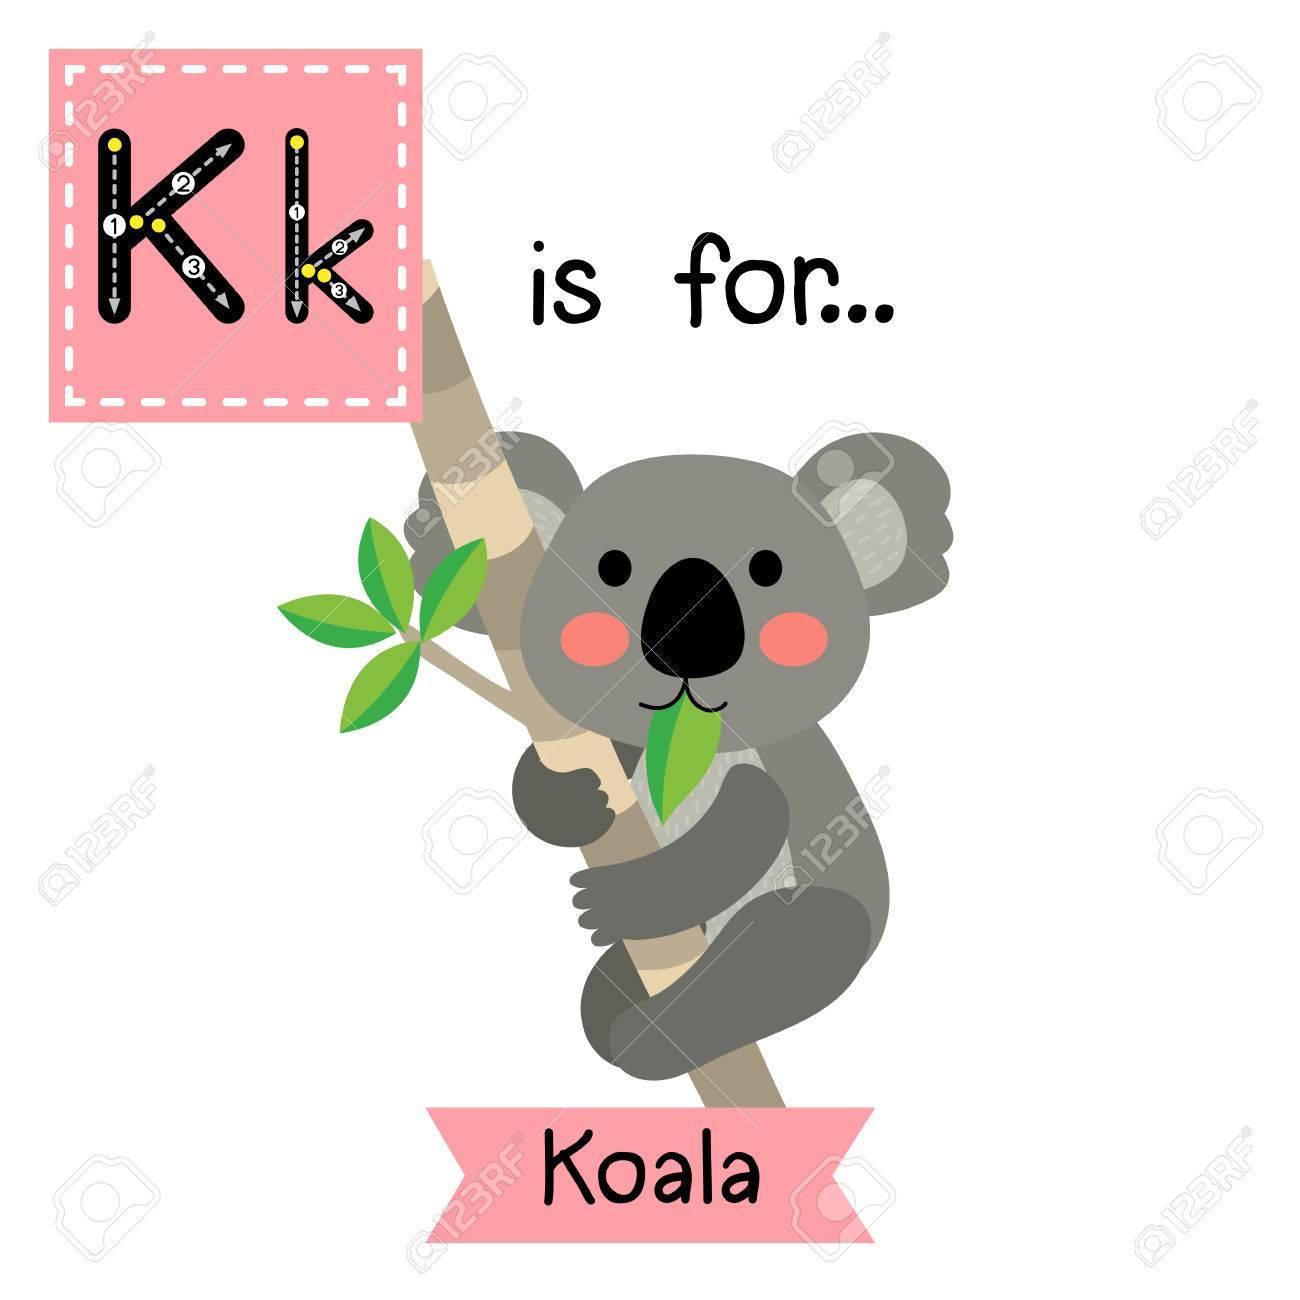 K Carta De Rastreo. Oso De Koala Que Suben El árbol. Tarjeta De ...